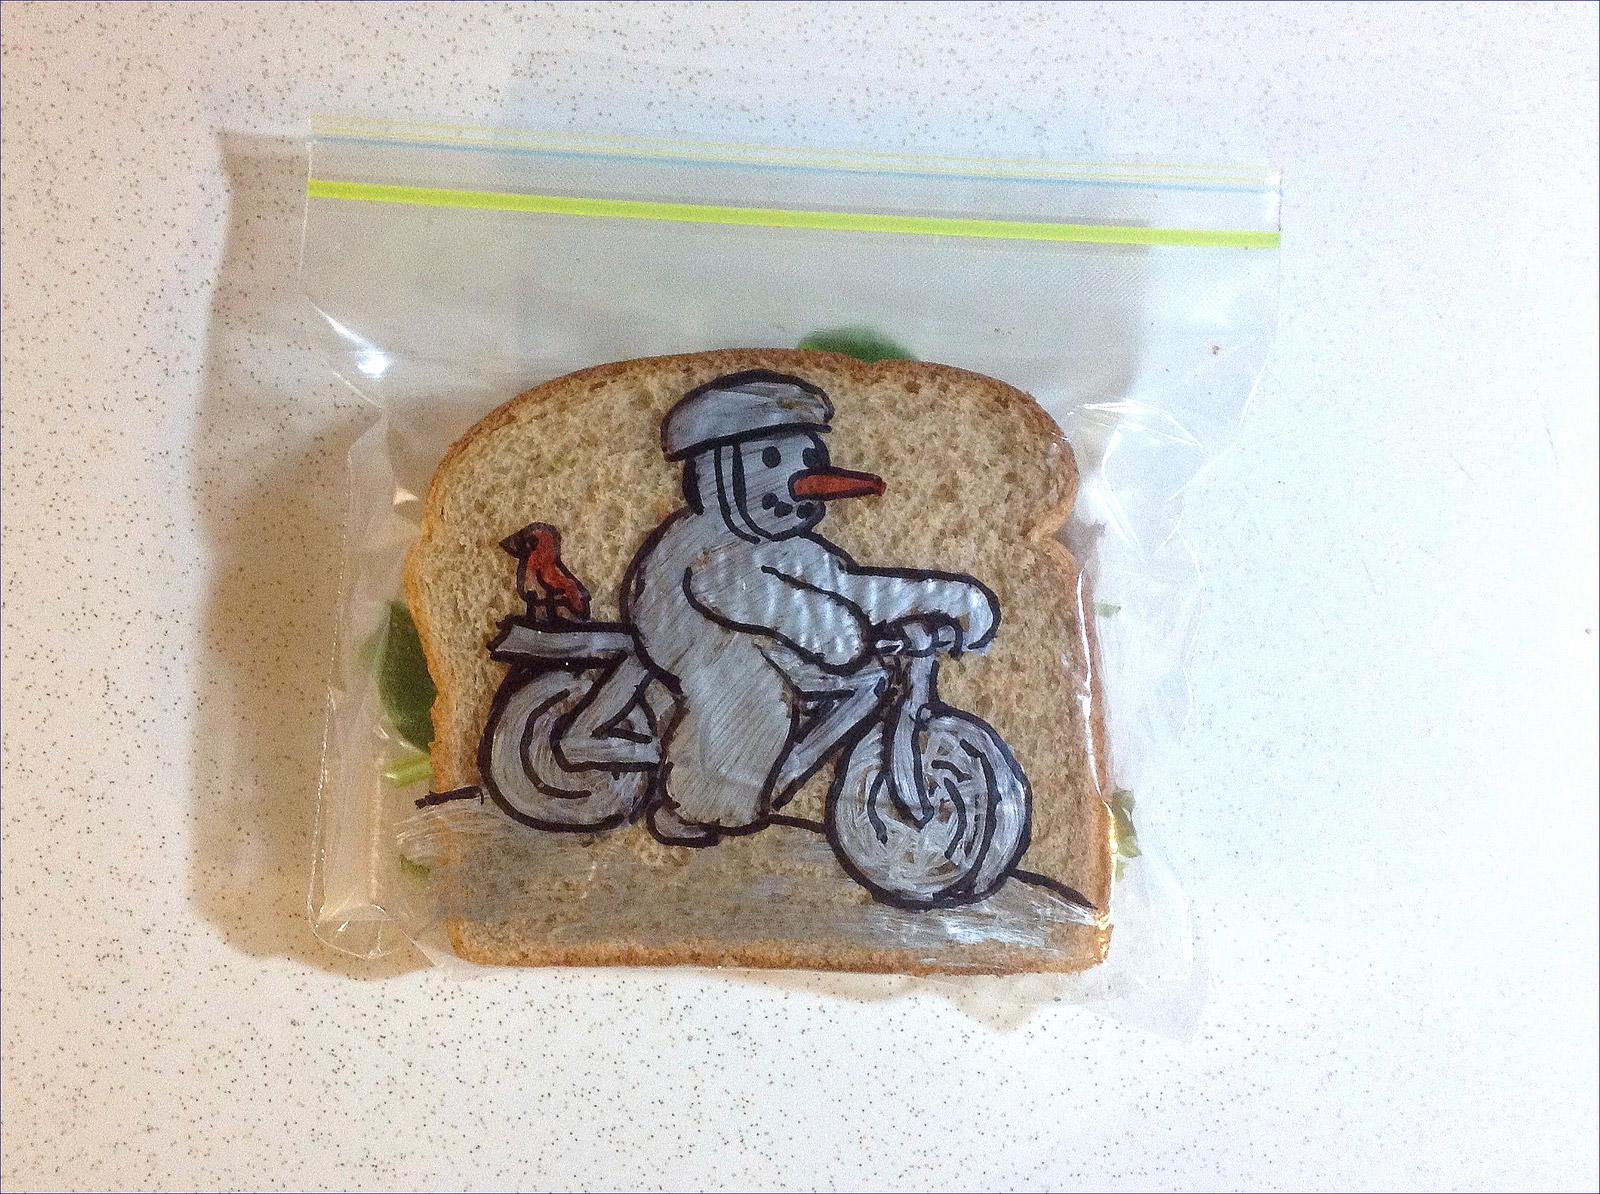 david-laferriere-creative-lunch-bag-illustration-15